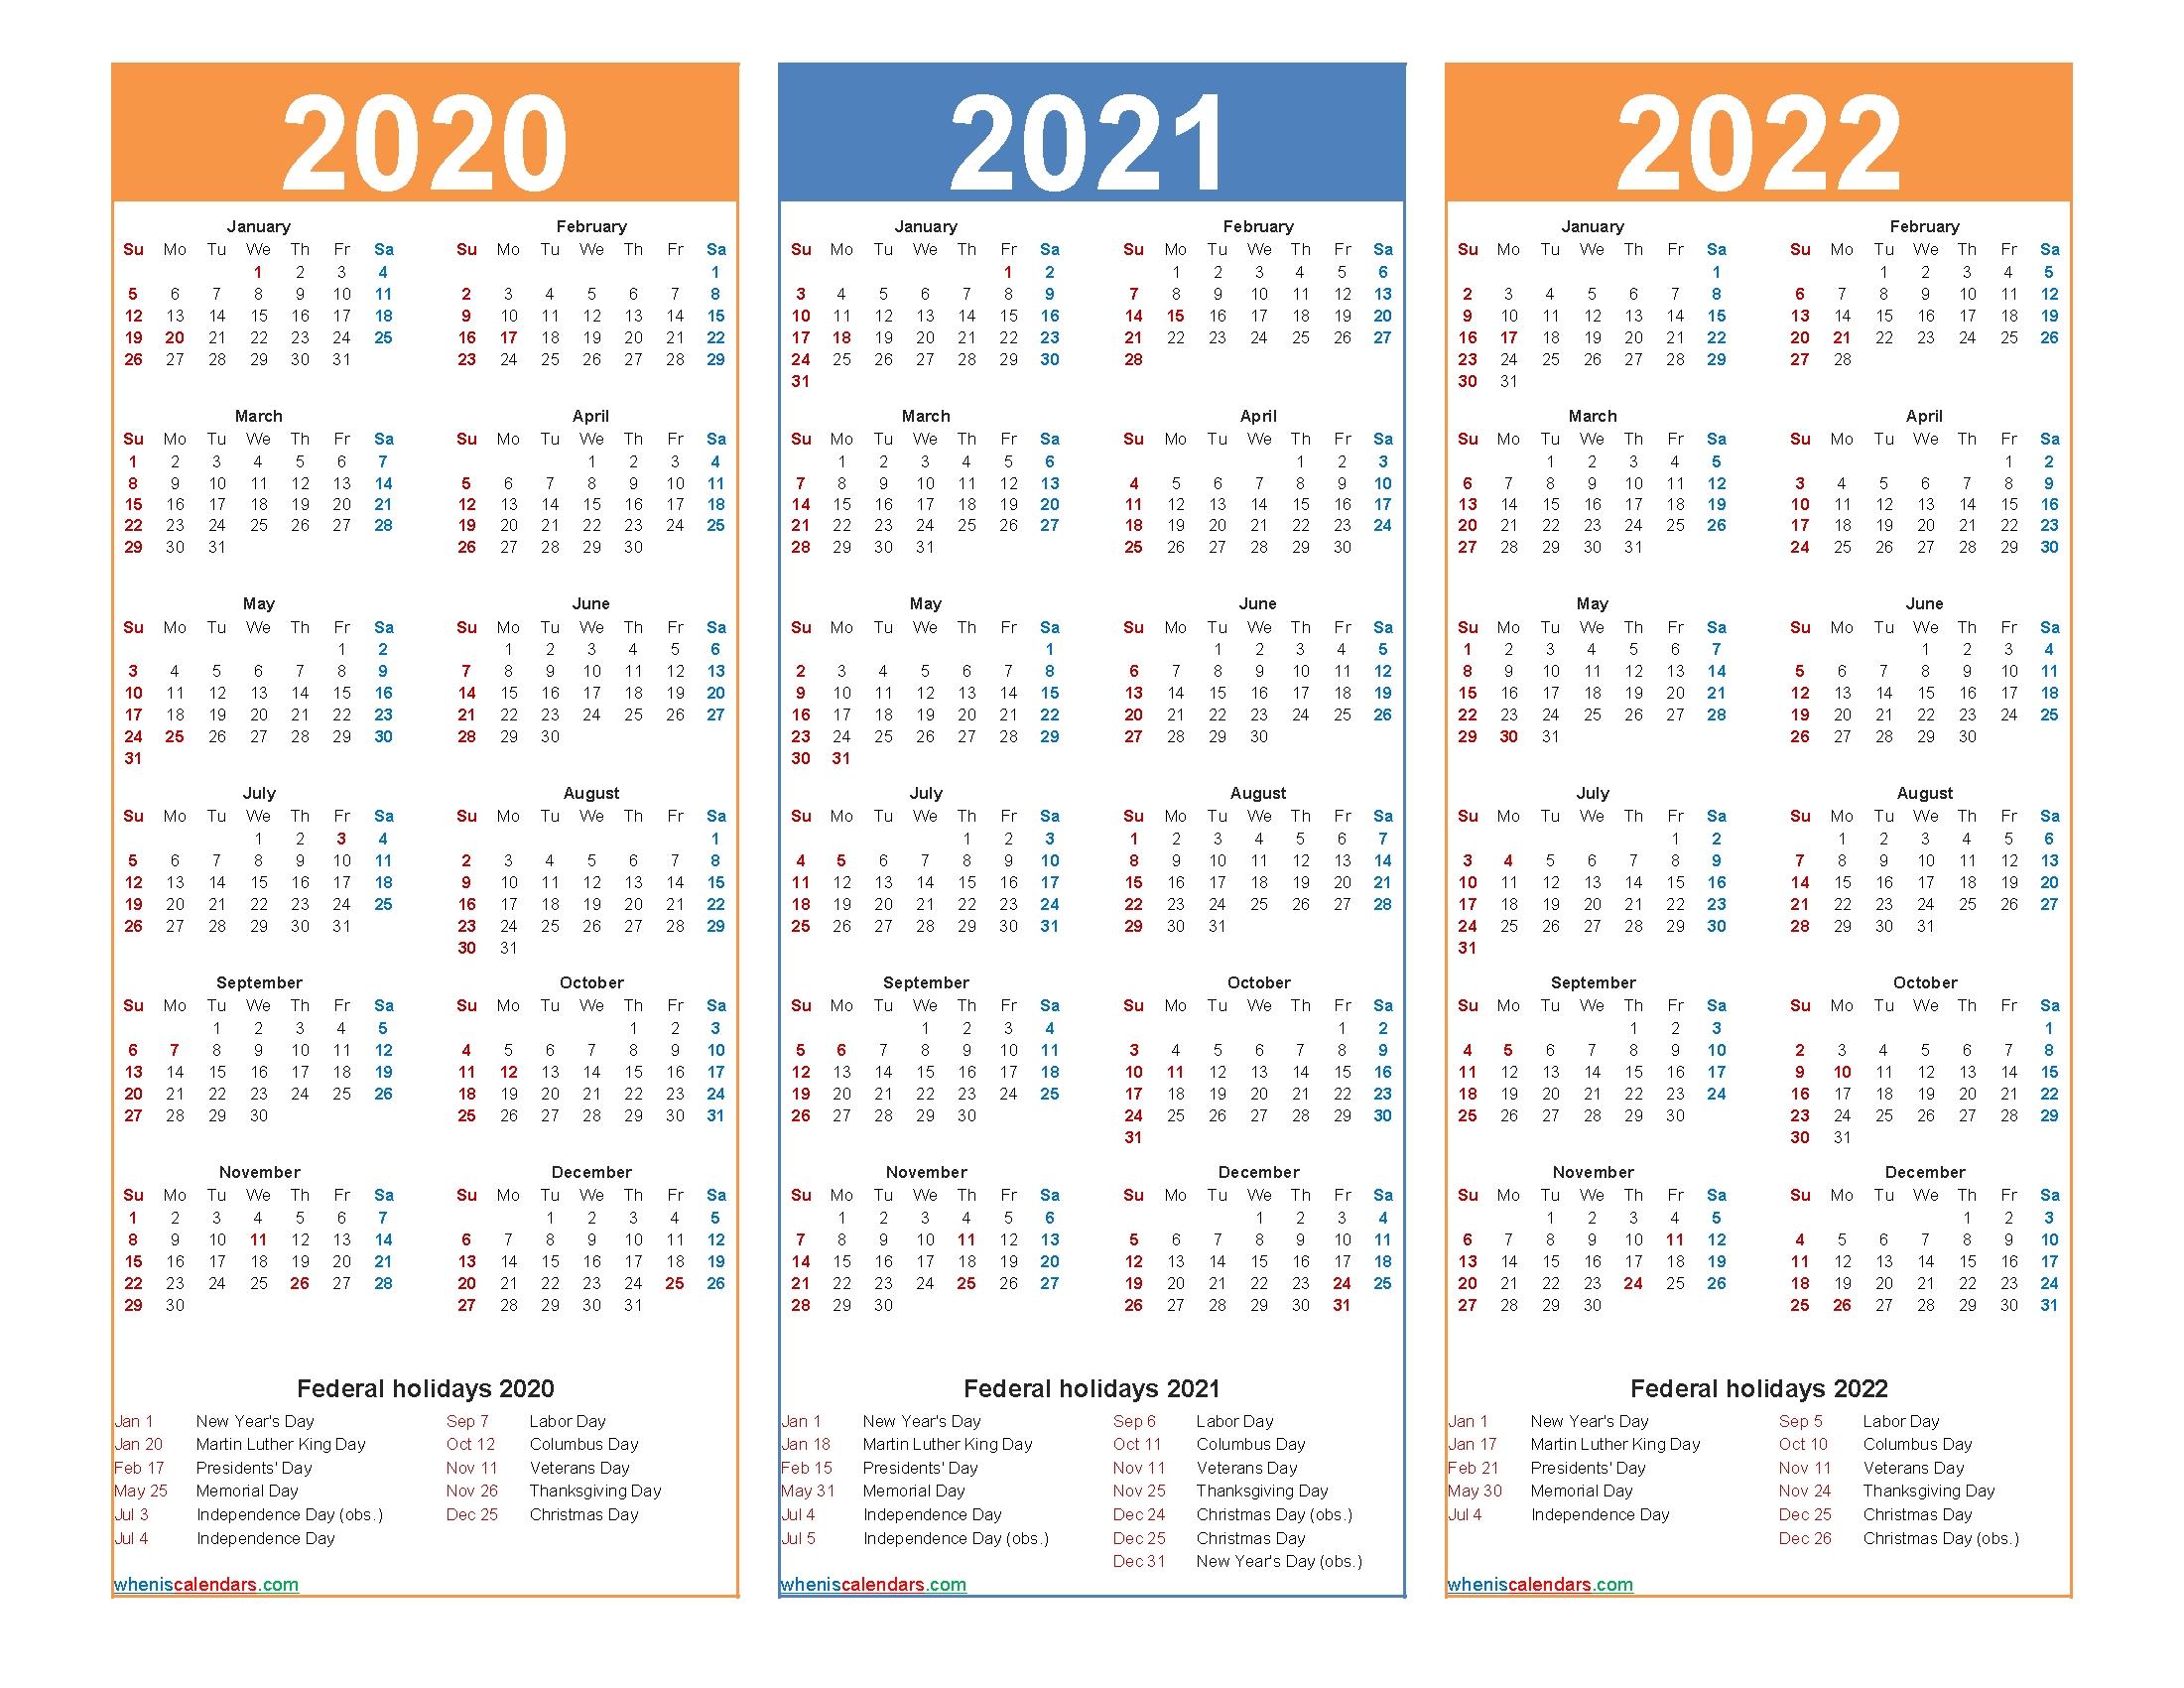 Printable Calendar 2020 2021 2022 With Holidays – Free within Printable Calendar 2020 2021 2022